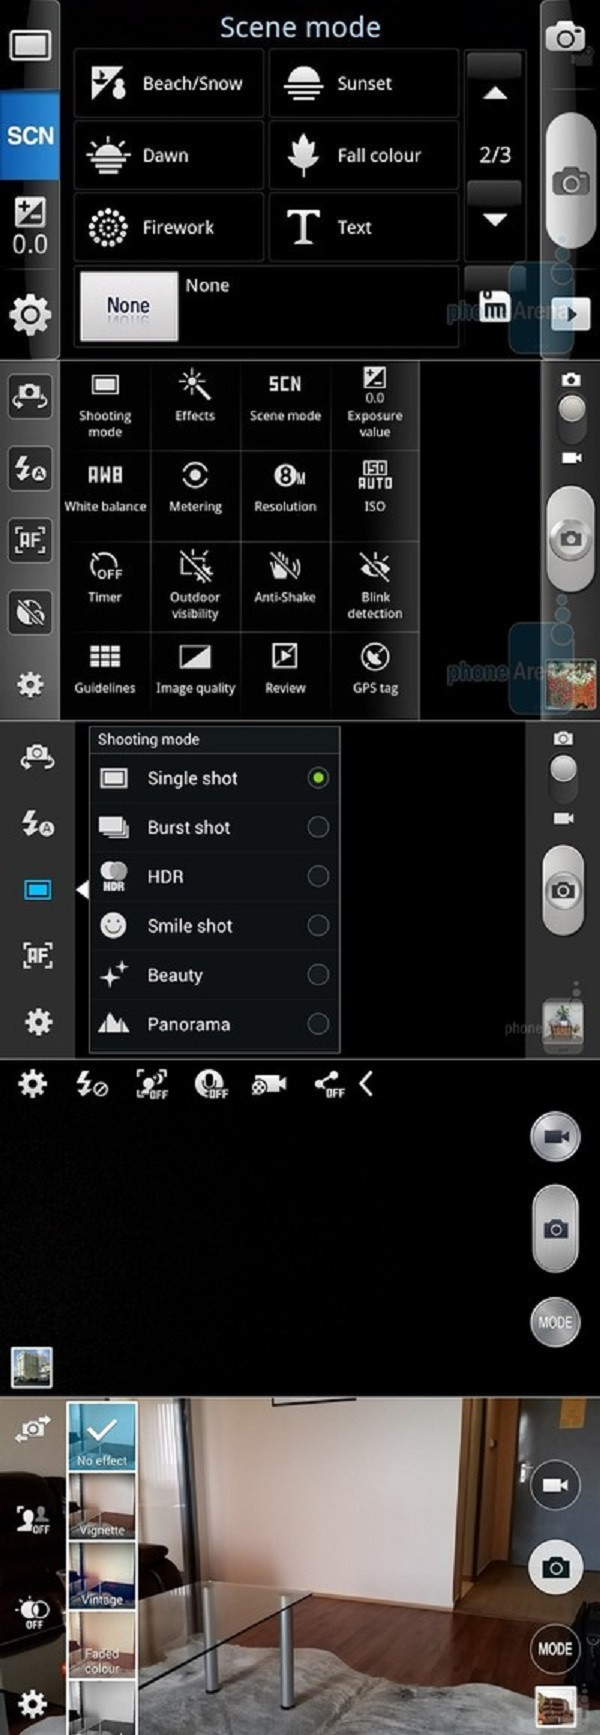 1398860401_touchwiz-cam.jpg